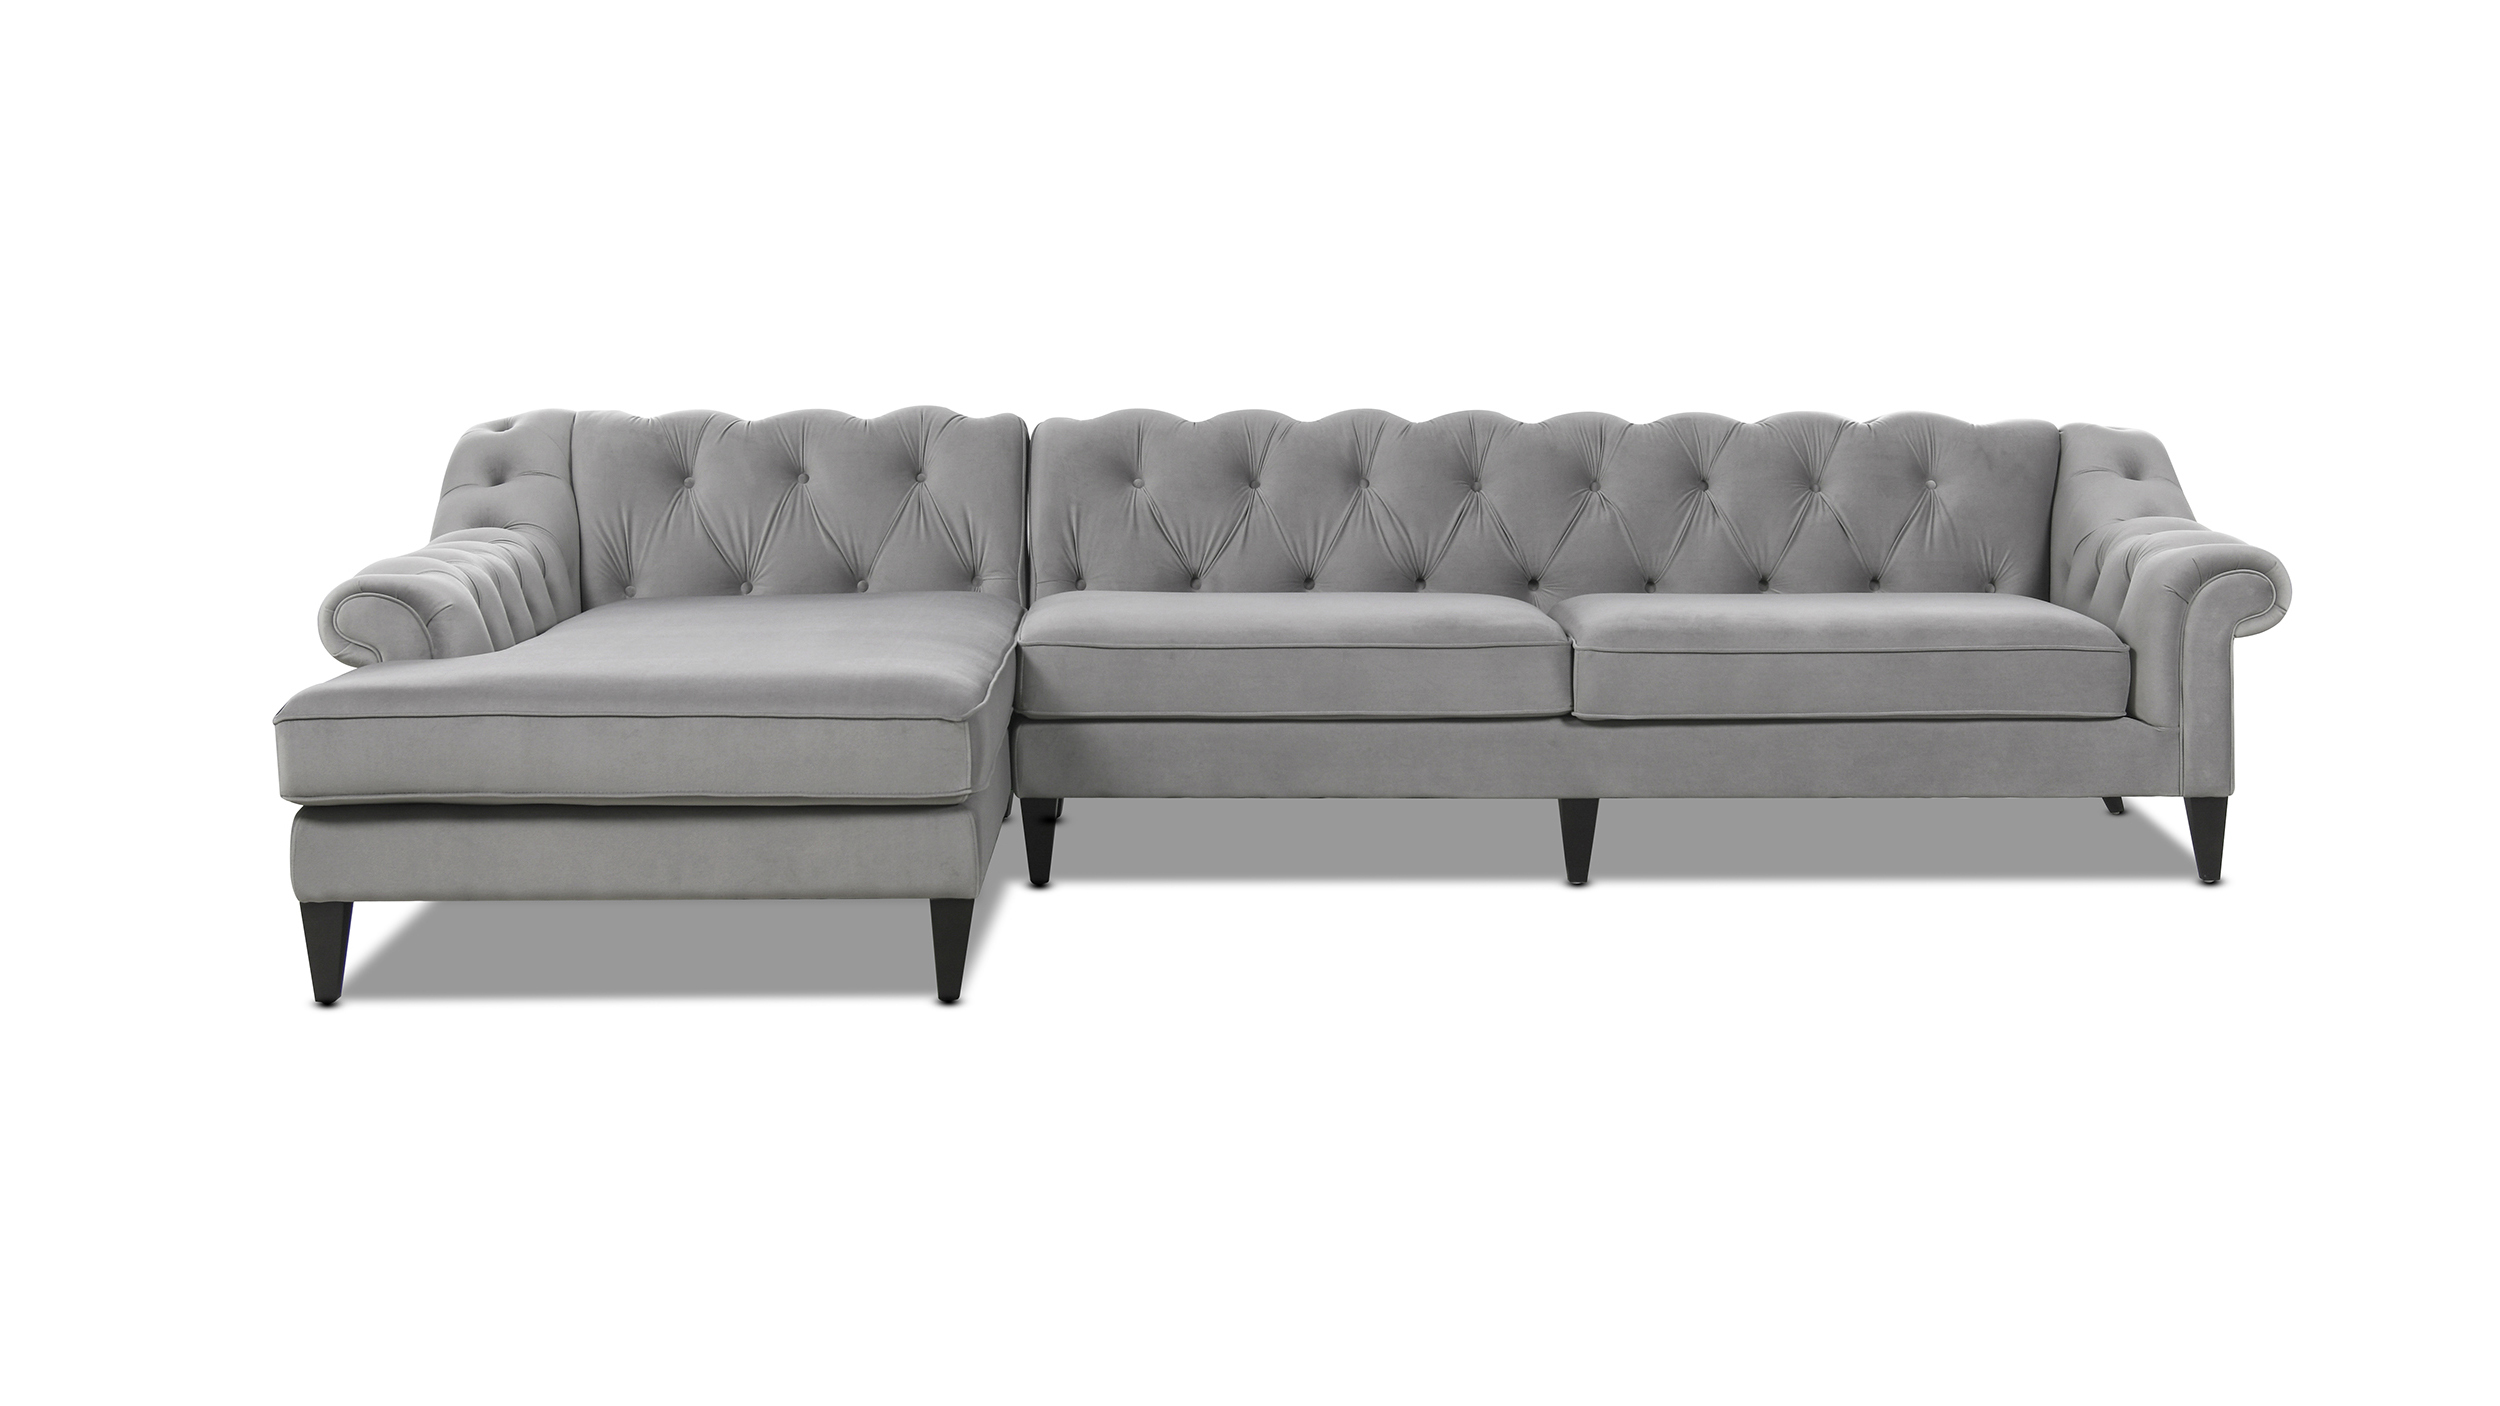 alexandra tufted left sectional sofa opal grey